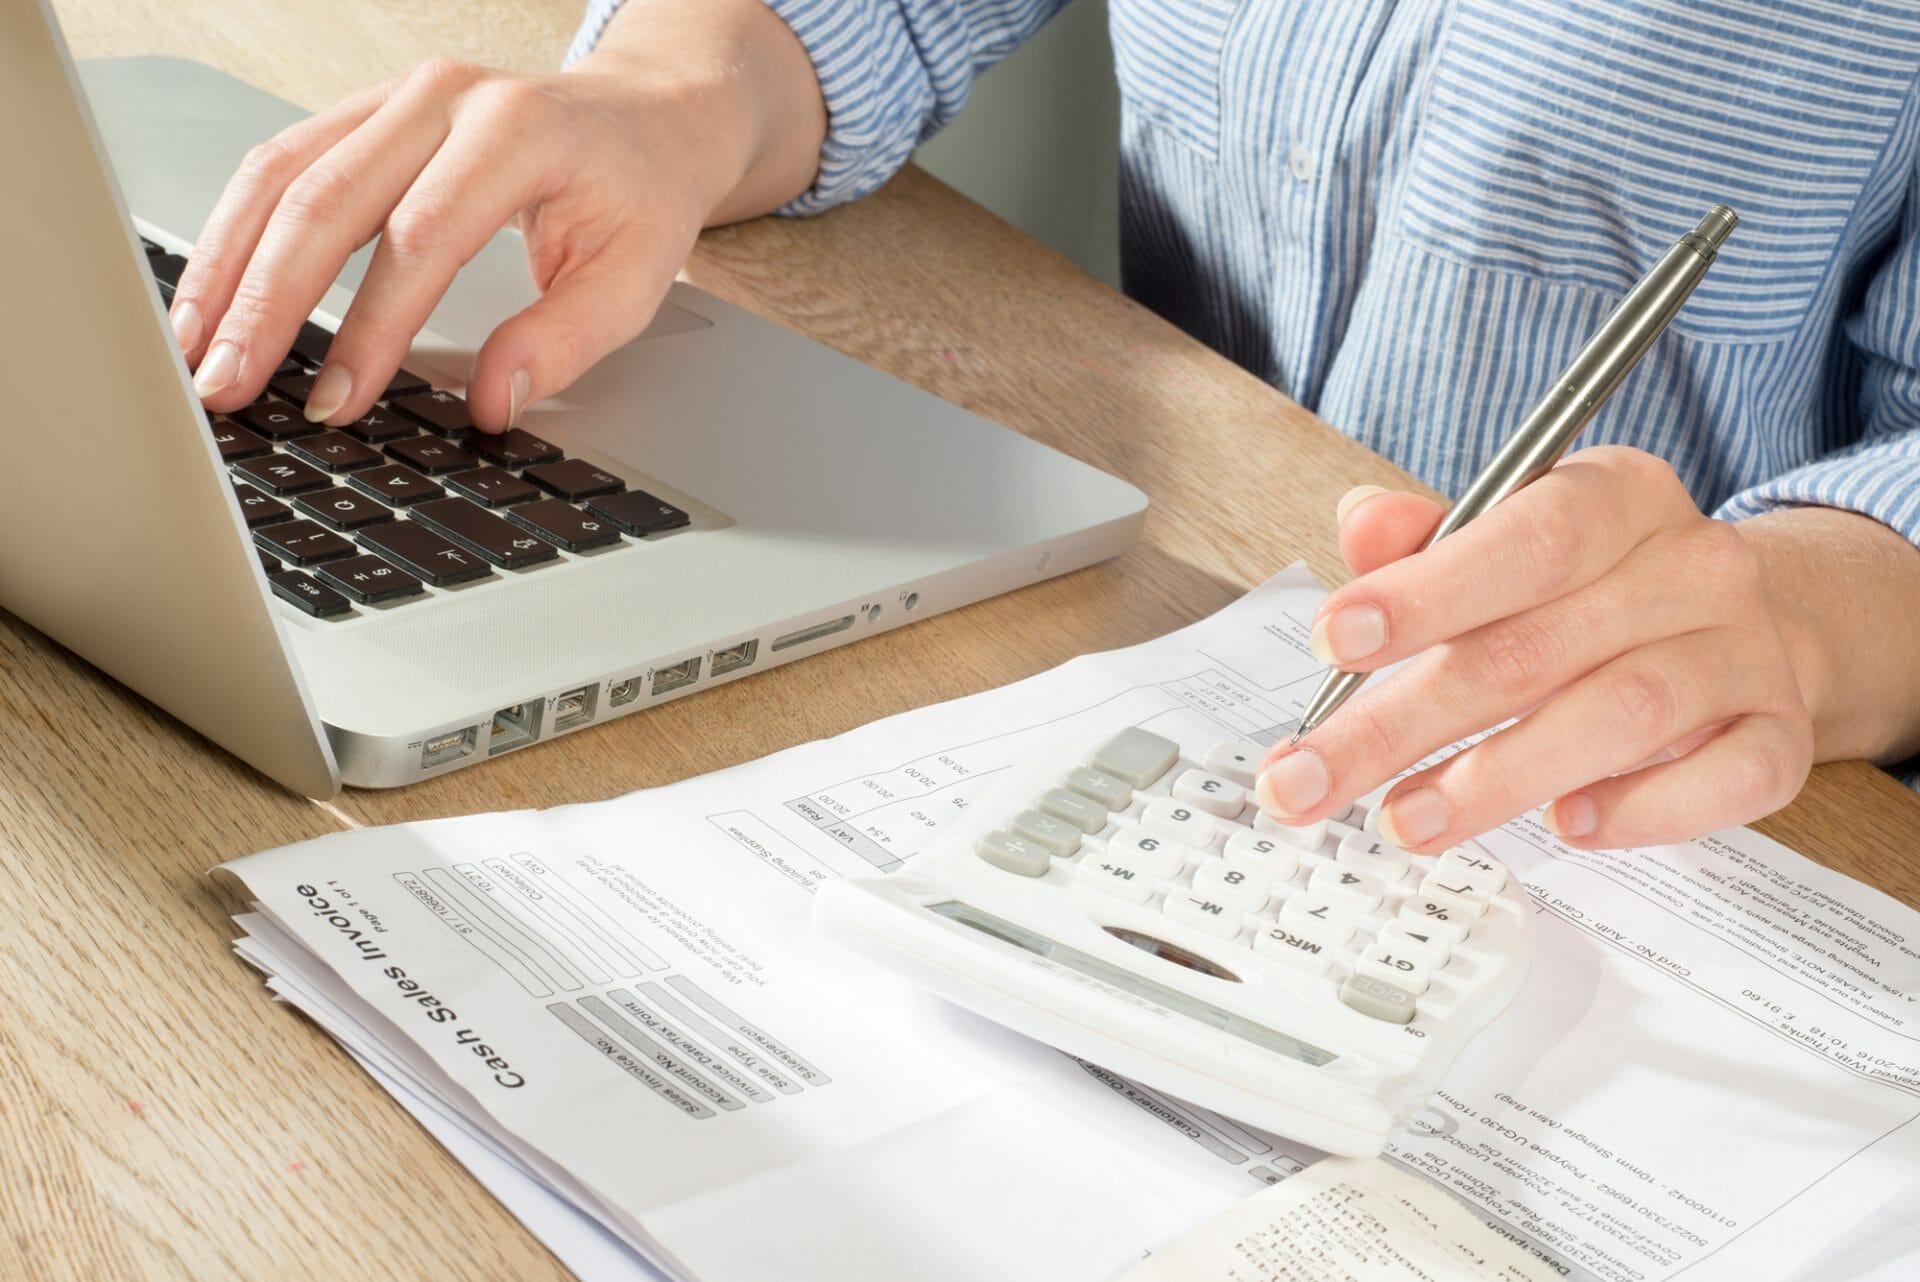 self-assessment tax return guide tradesman